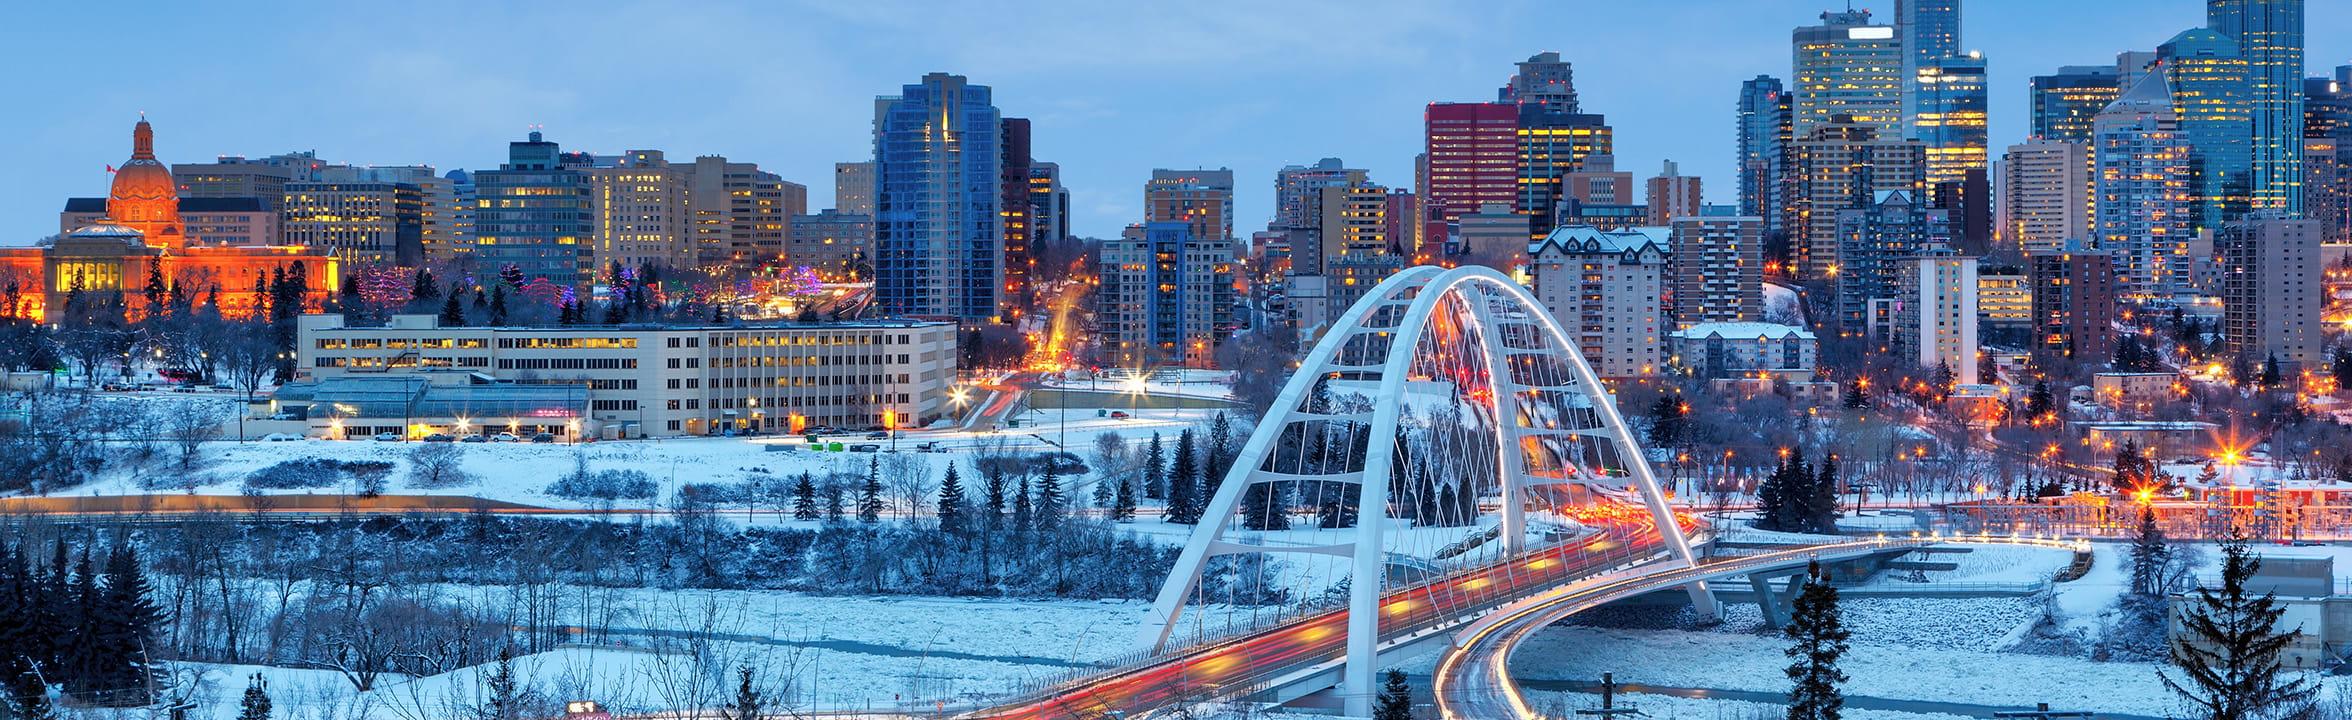 Edmonton Alberta, Canada